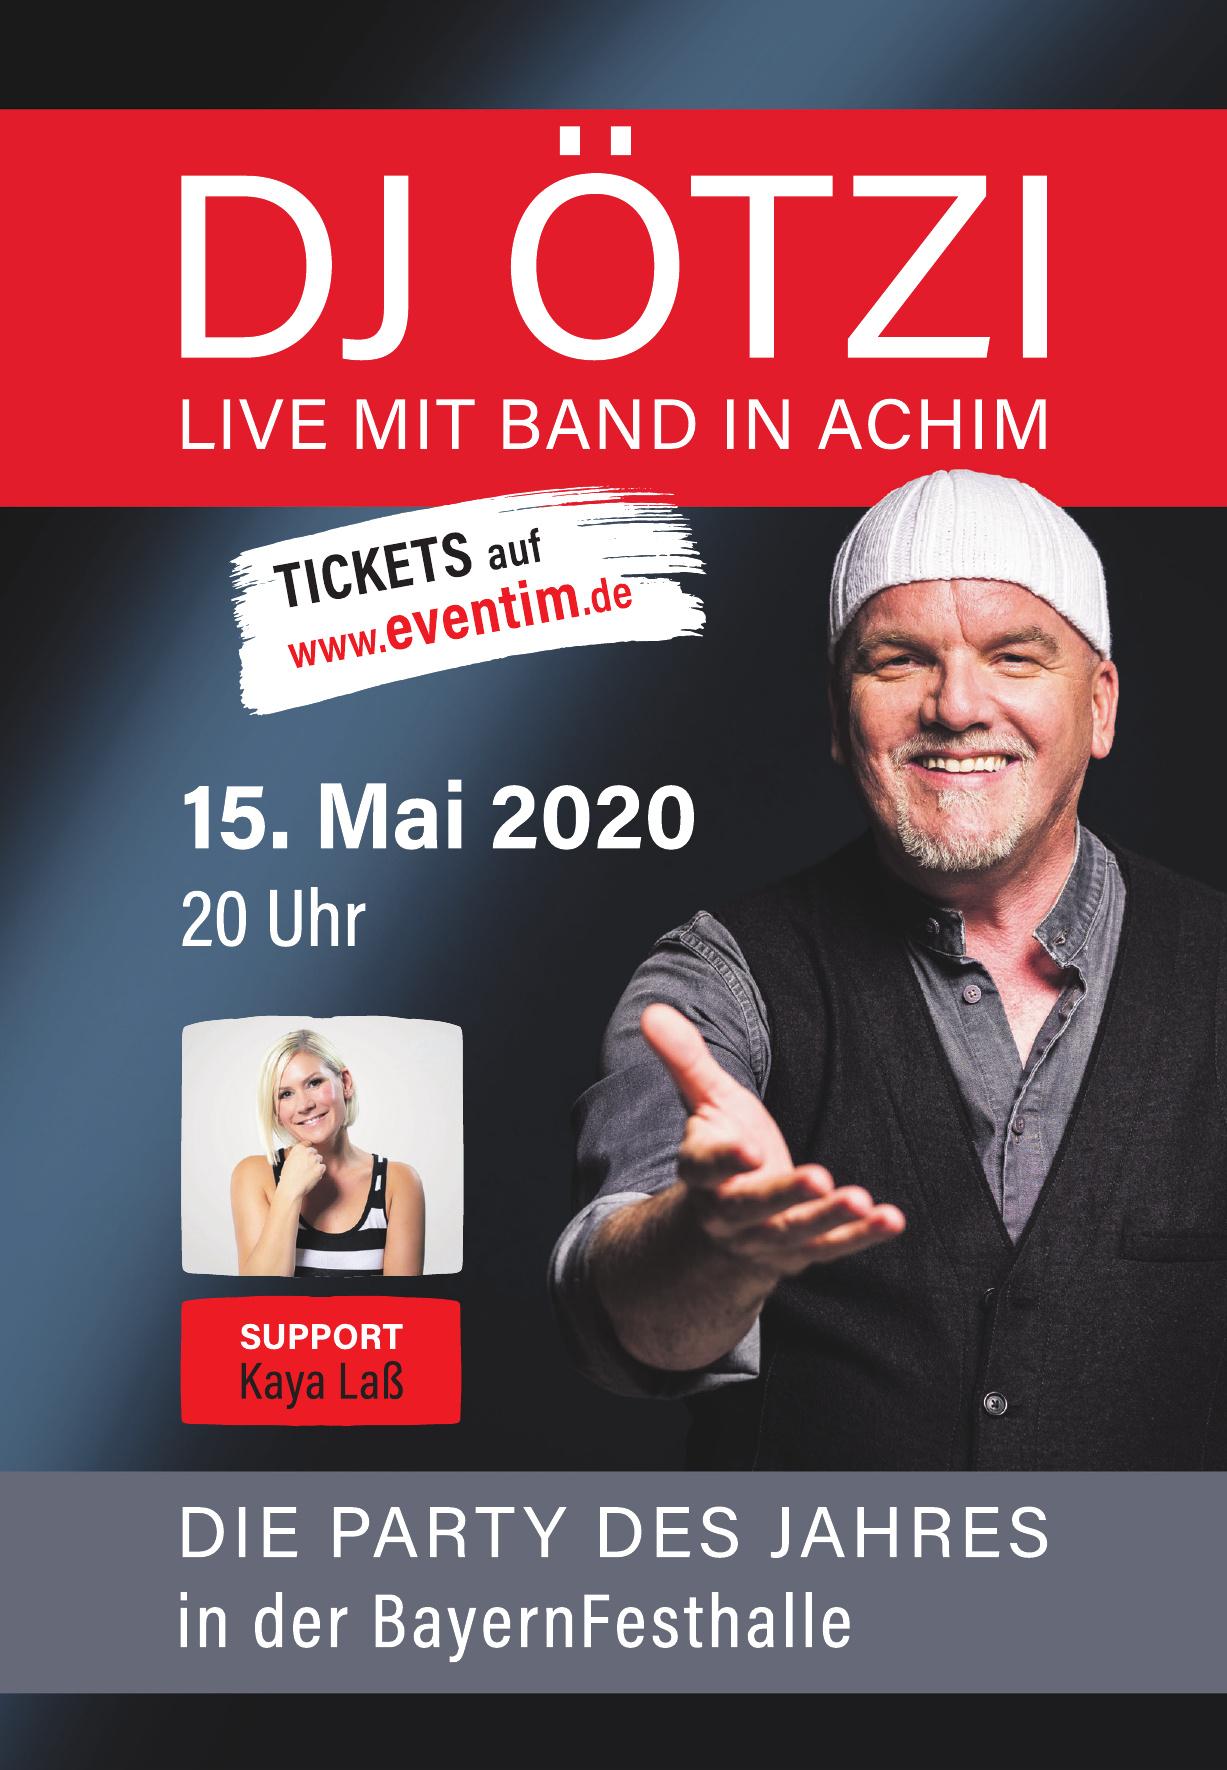 DJ Ötzi Live mit Band in Achim